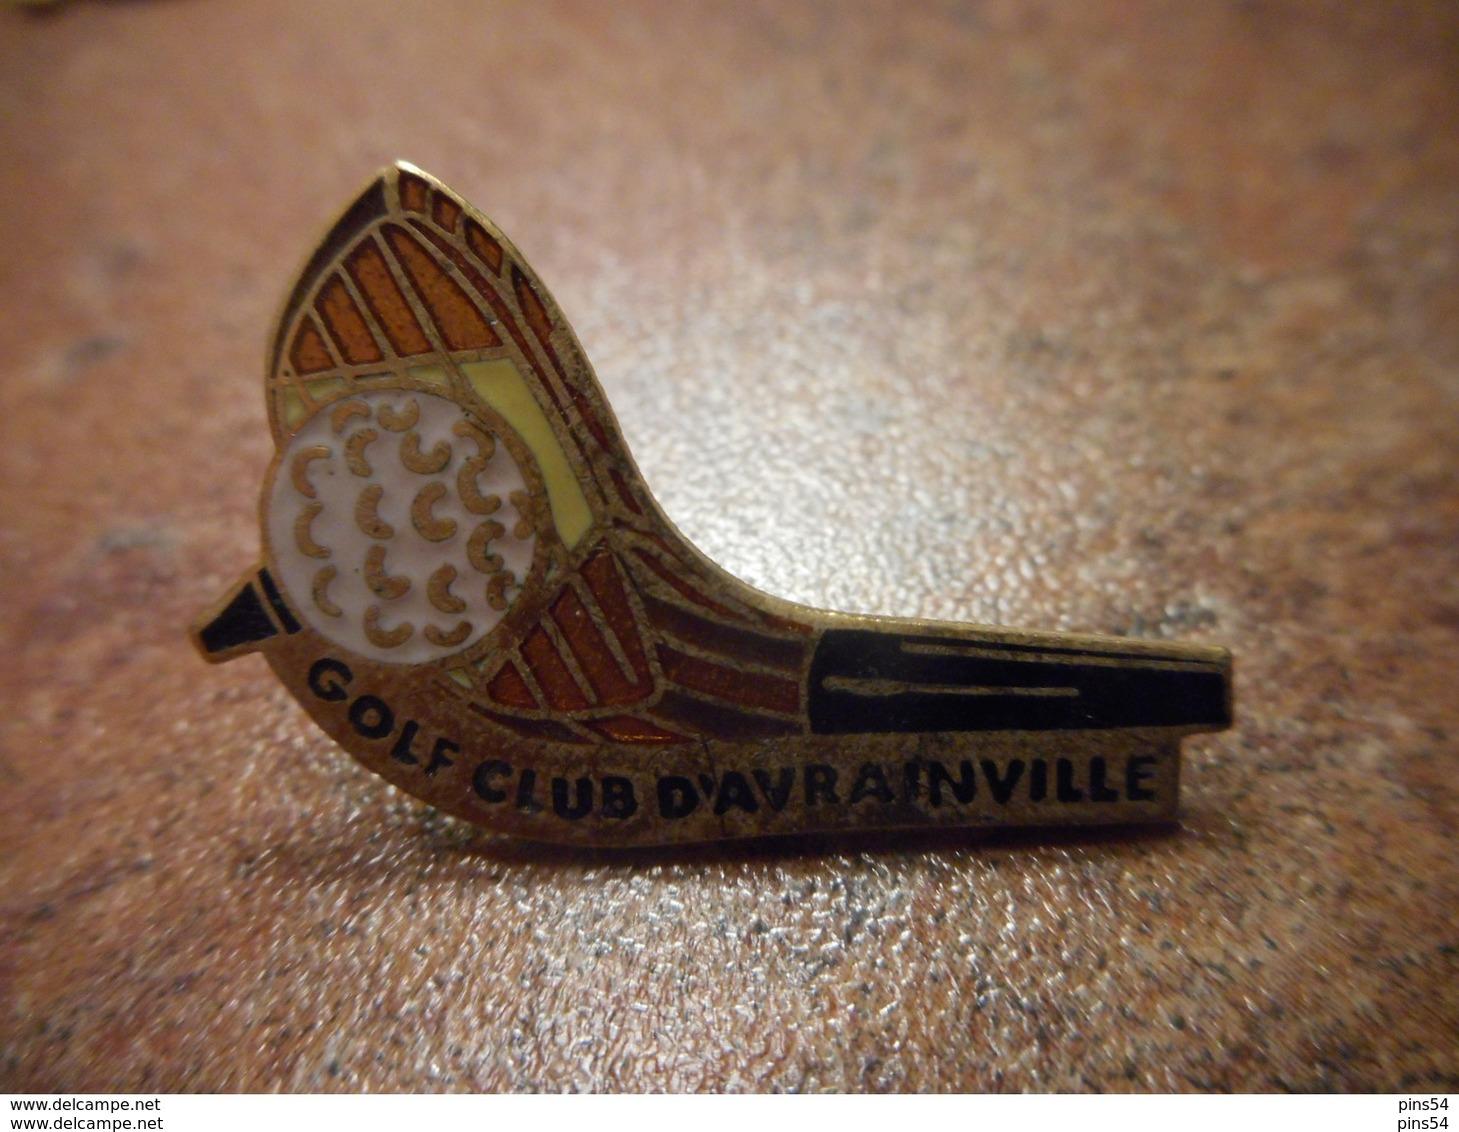 A029 -- Pin's Golf Club D'Avrainville - Golf